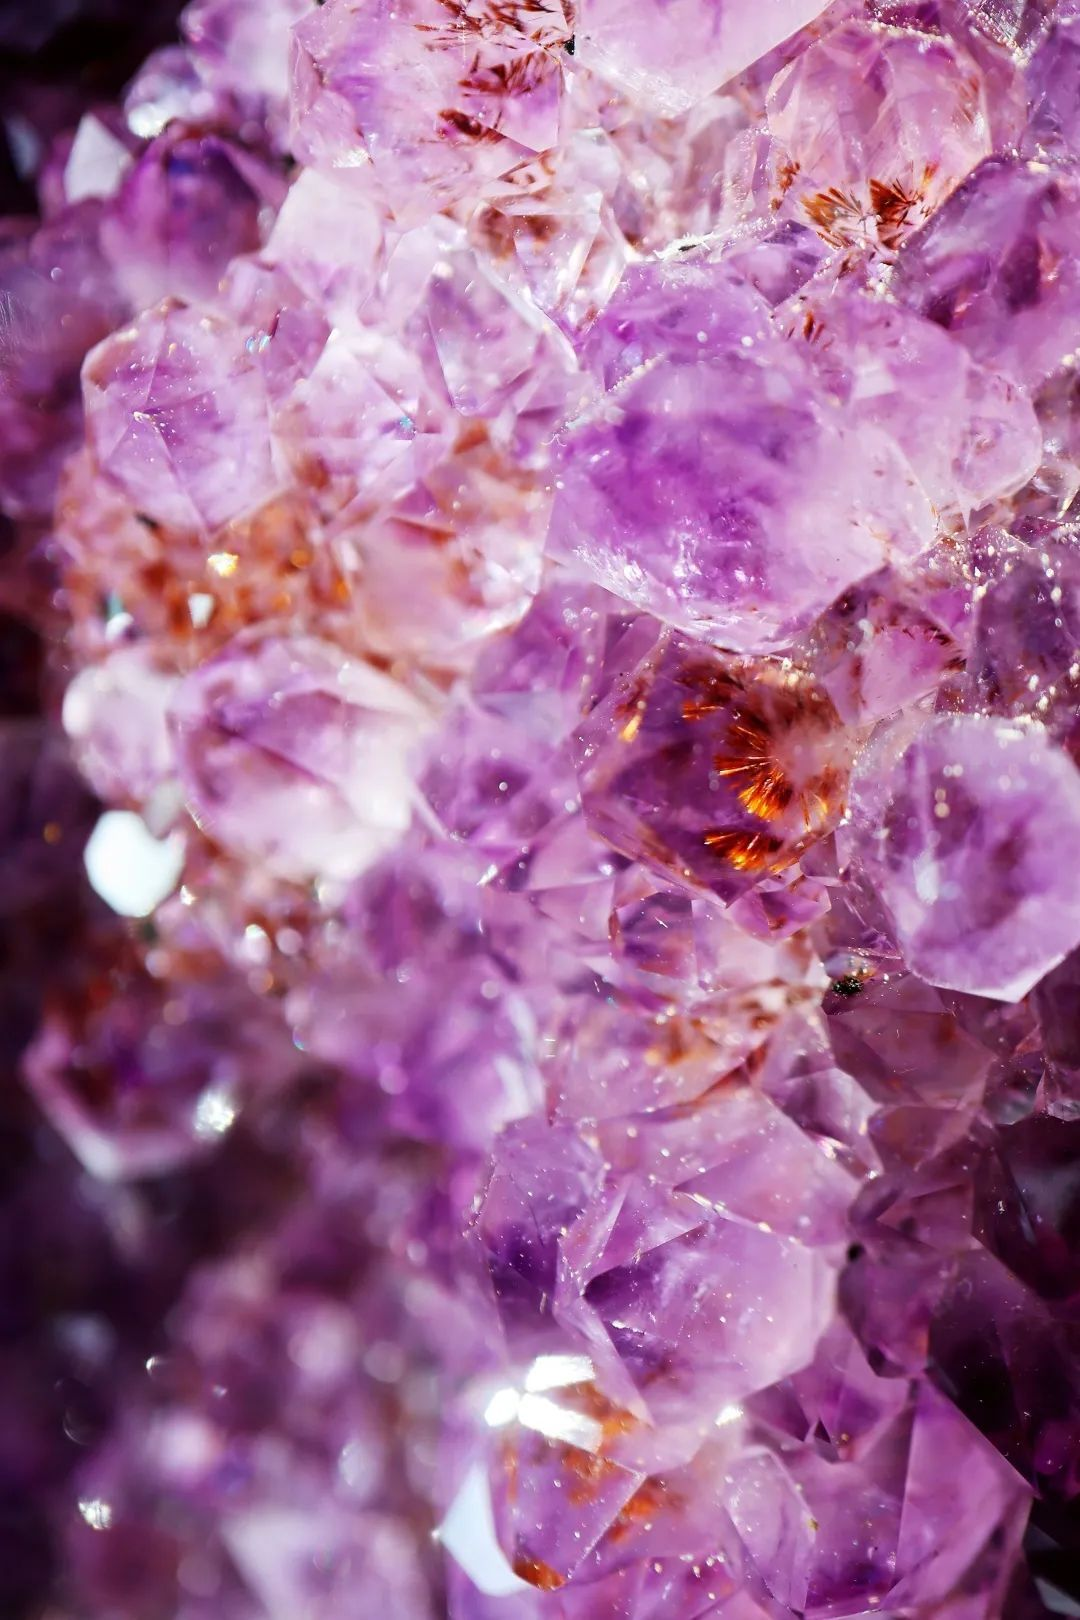 resize,m fill,h 1620,w 1080 - 紫晶洞的功效作用和形状有关系吗?选什么形状的紫晶洞最好?